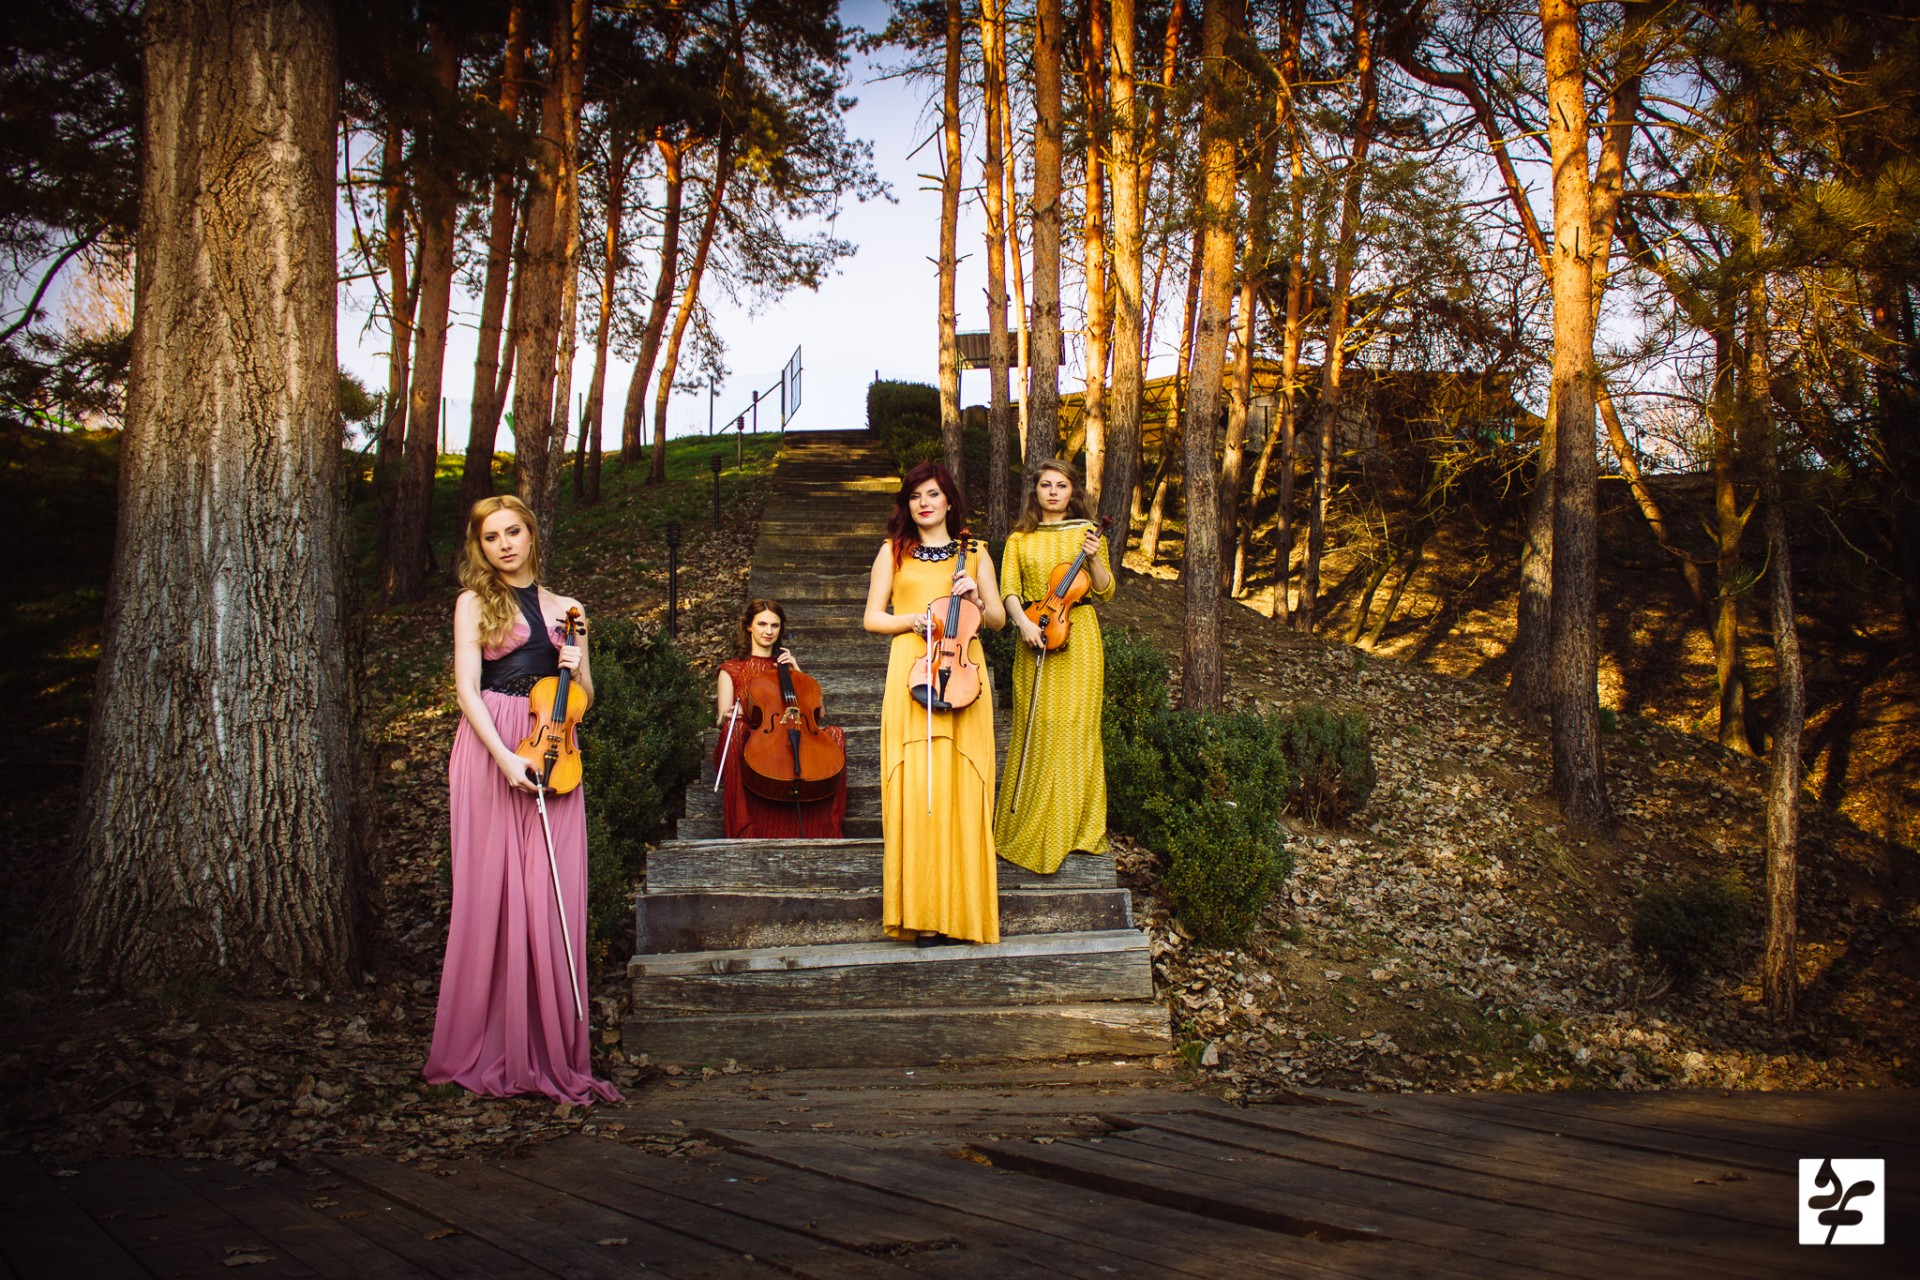 Nuages-Quartet-1